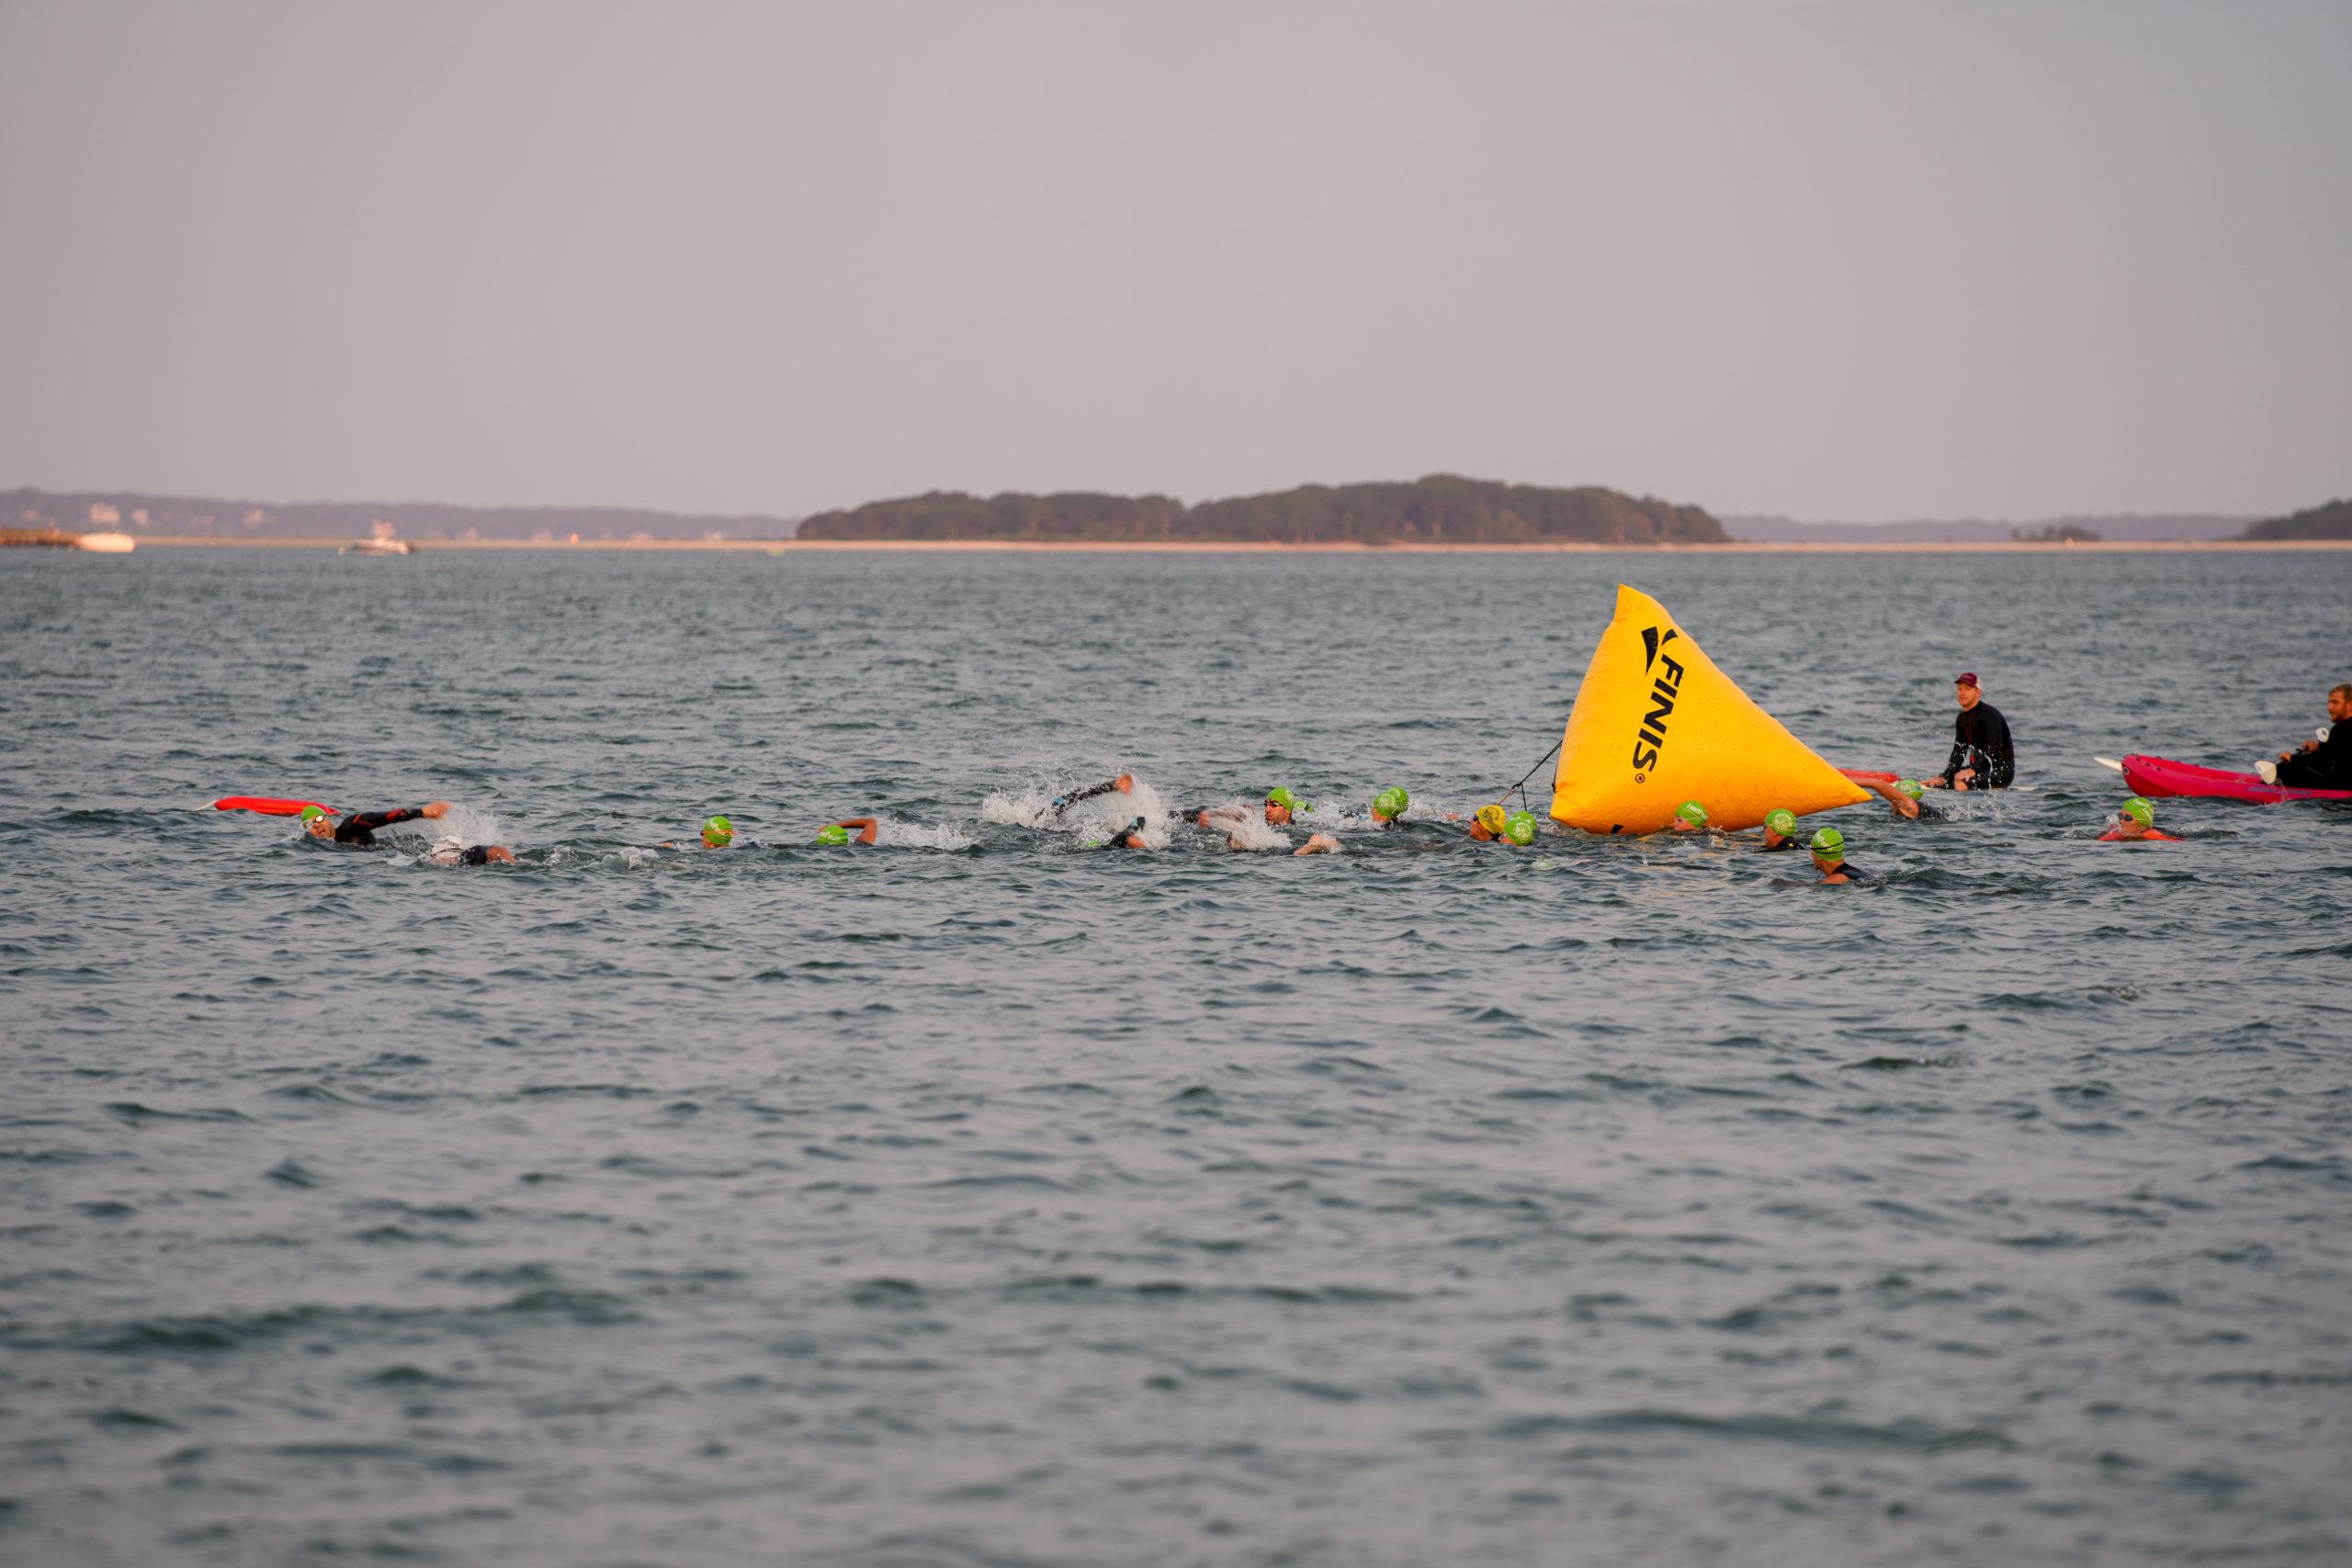 The Mighty Hamptons Triathlon began with a 1.5-mile swim along Long Beach on Sunday morning.